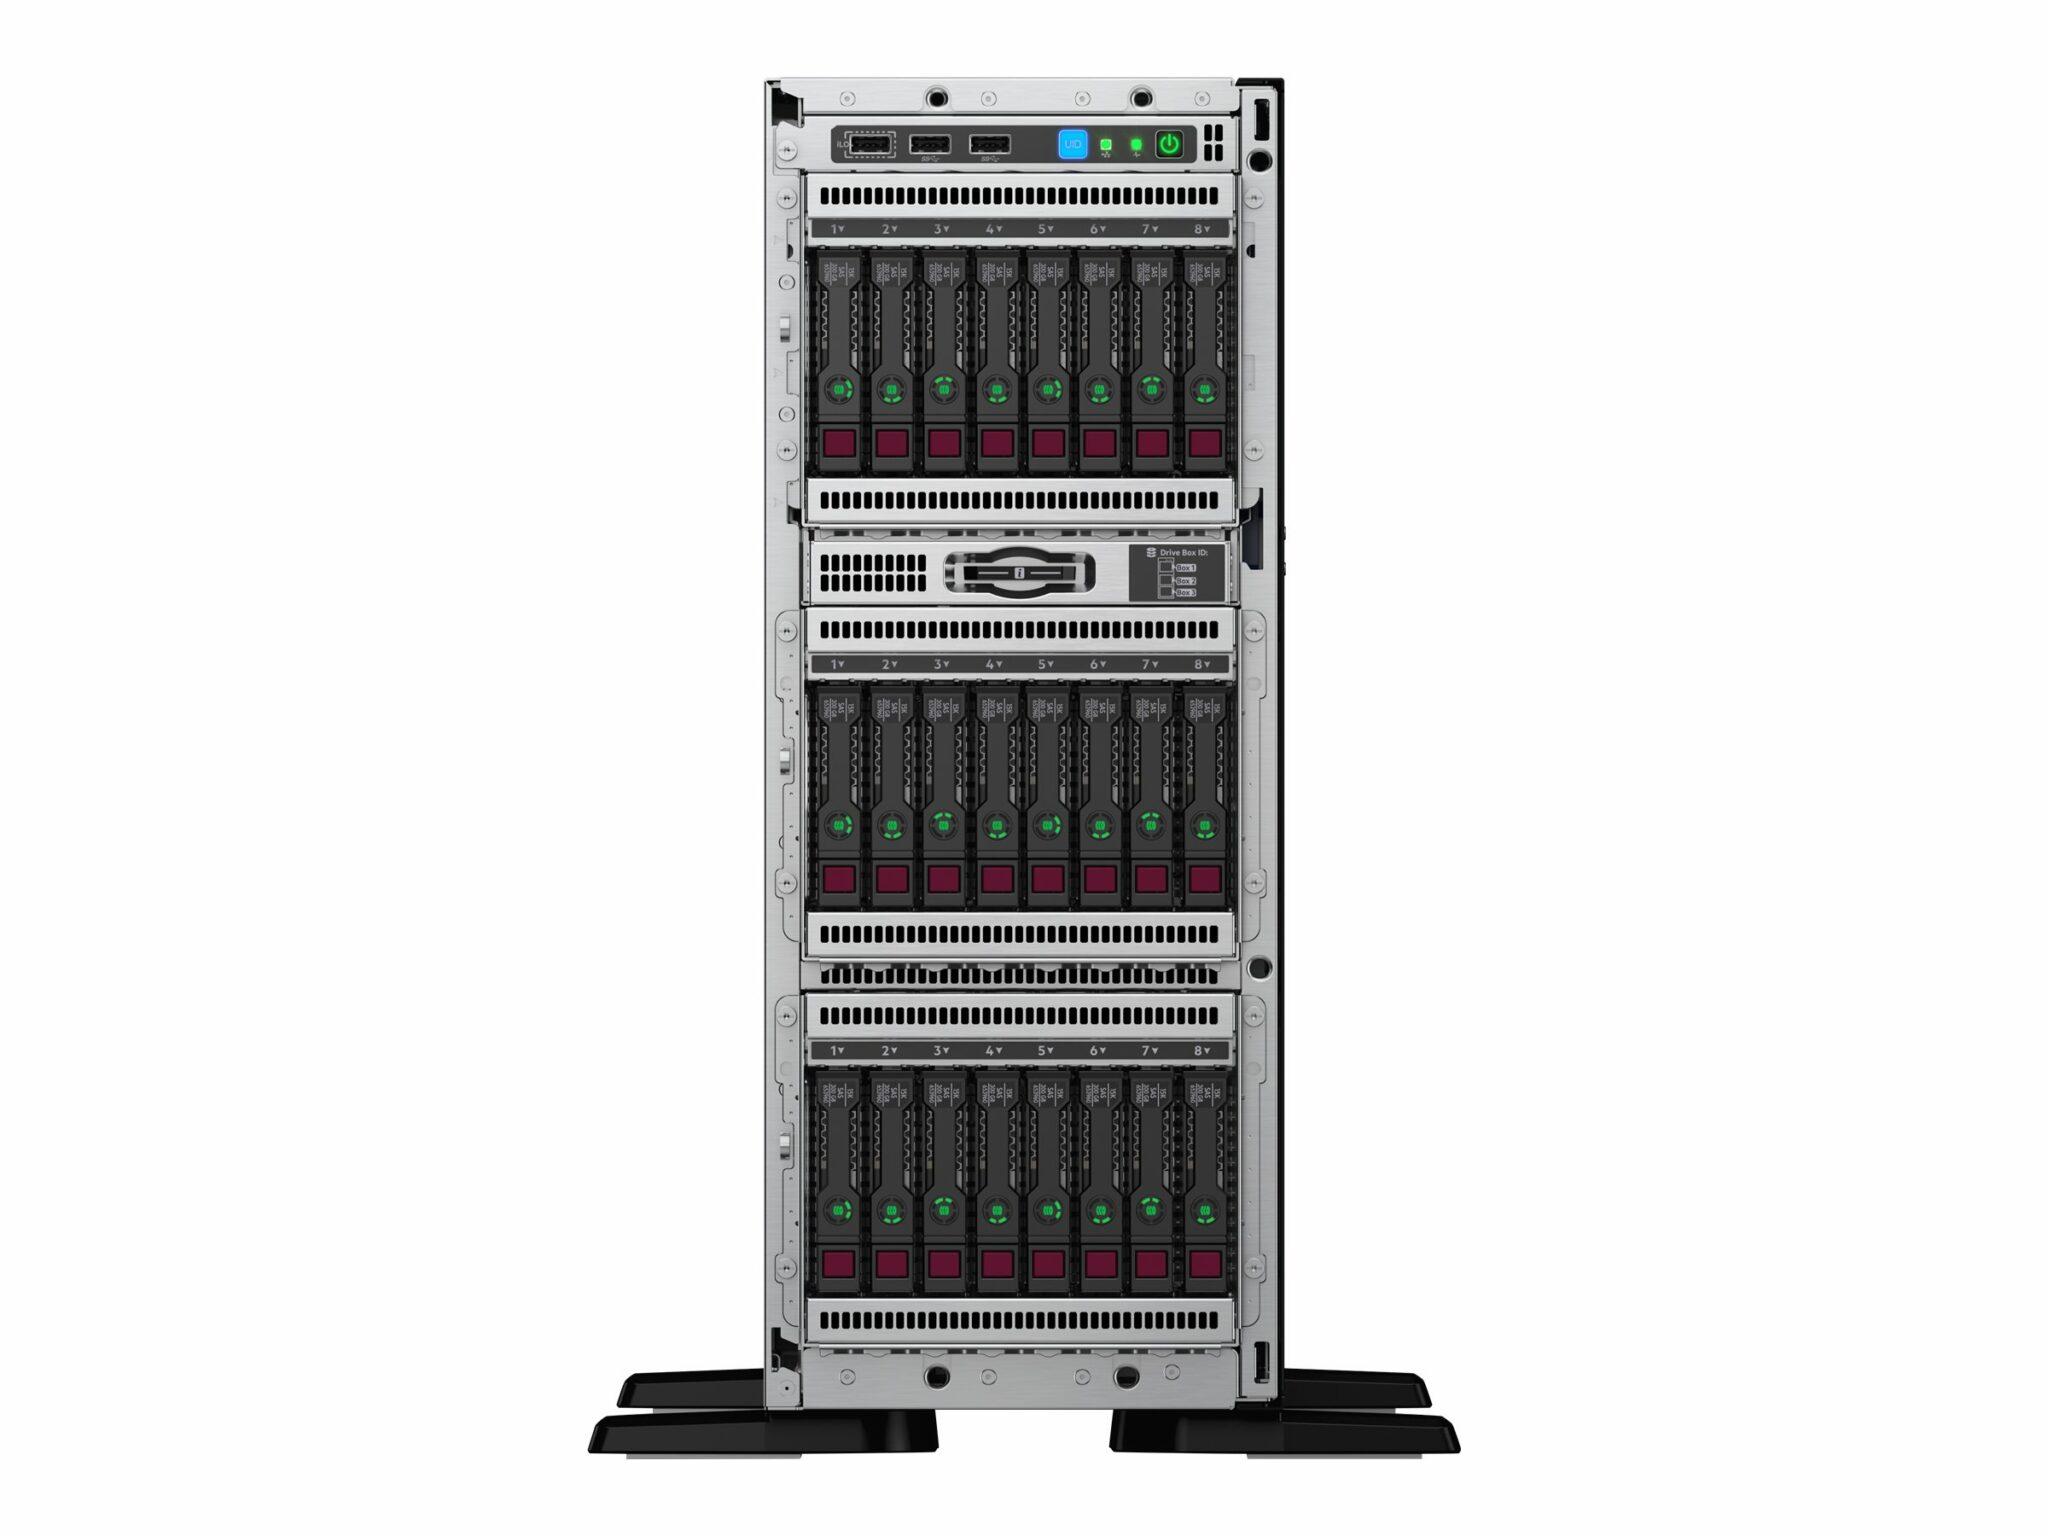 HPE ProLiant ML350 Gen10 Base – Server – tower – 4U – 2-way – 1 x Xeon Silver 4110 / 2.1 GHz – RAM 16 GB